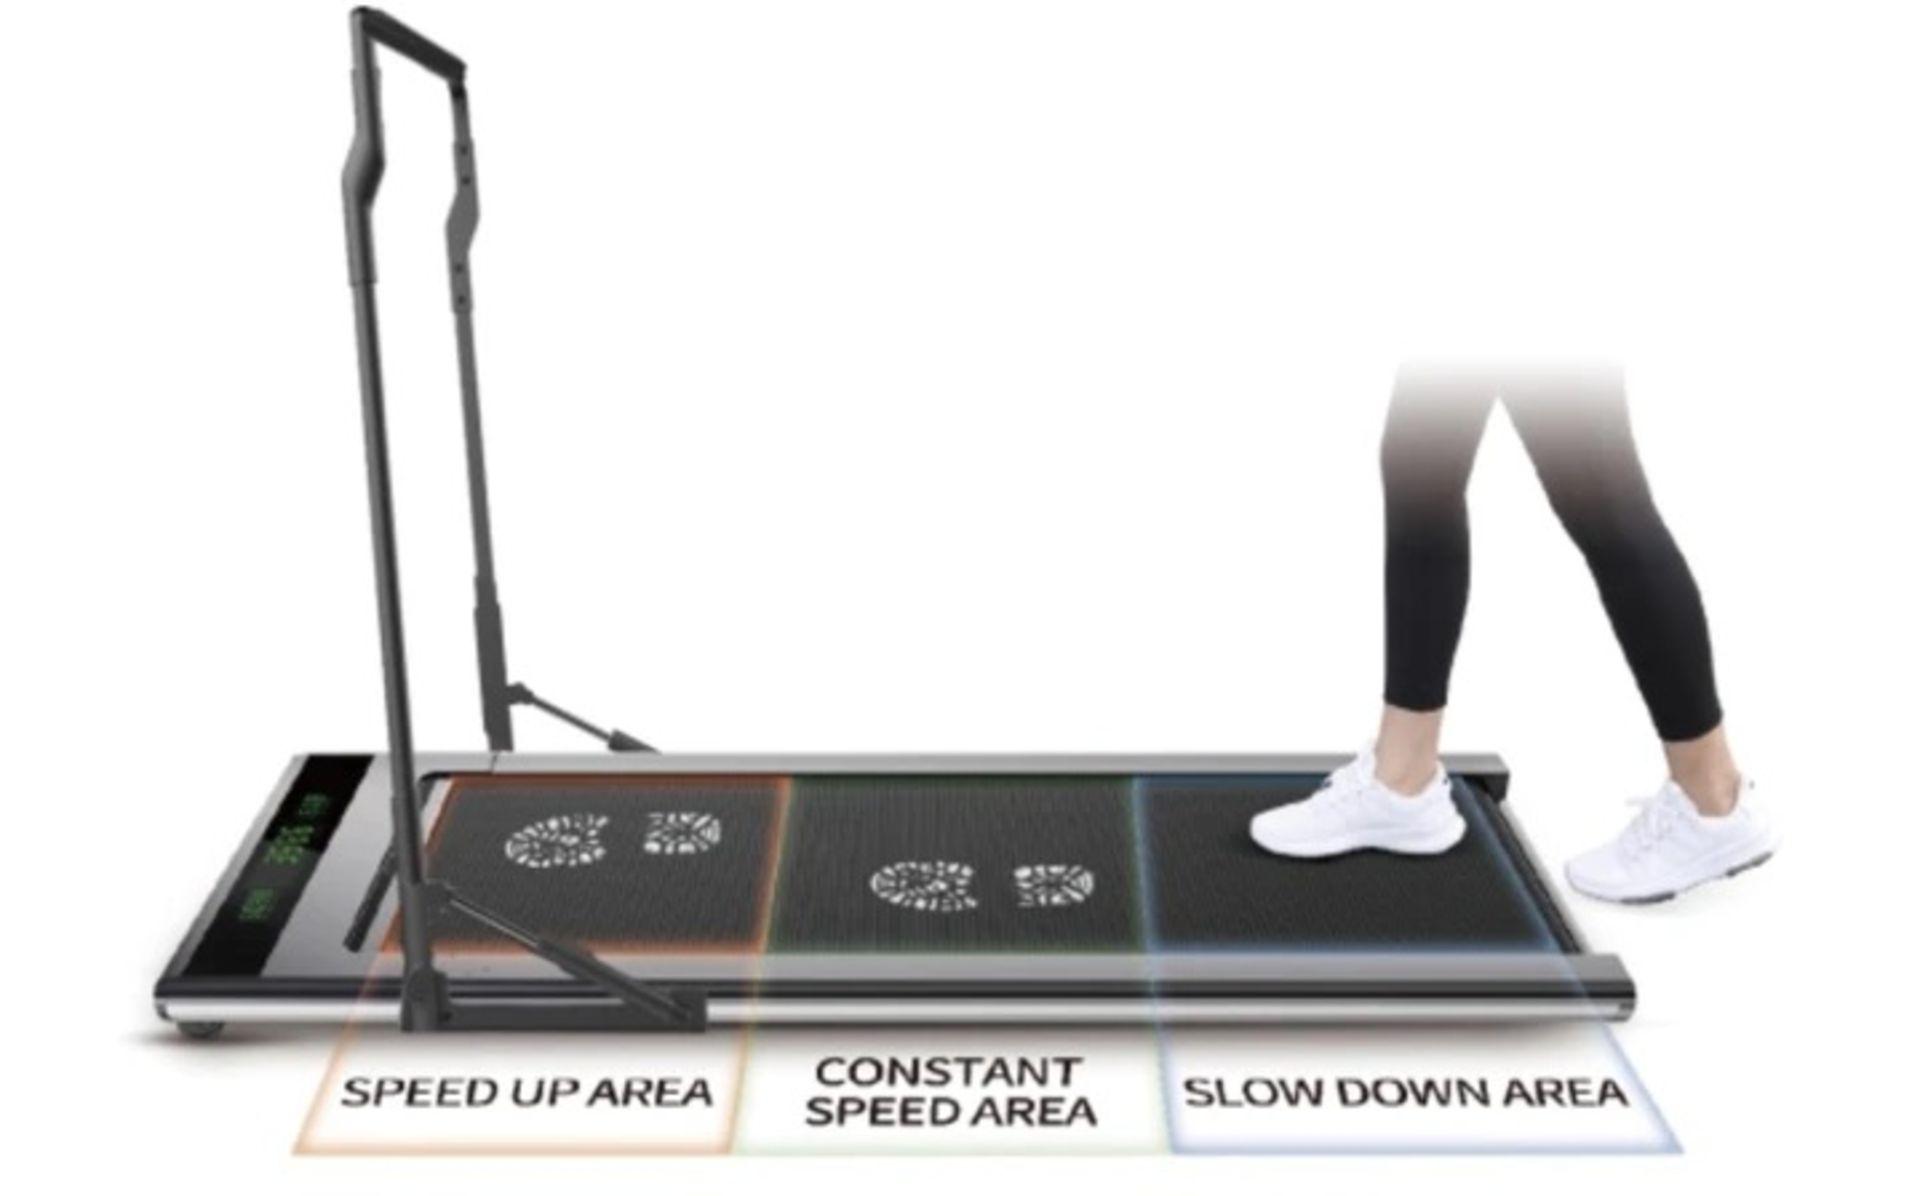 1 x Slim Tread Ultra Thin Smart Treadmill Running / Walking Machine - Lightweight With Folding - Image 14 of 19